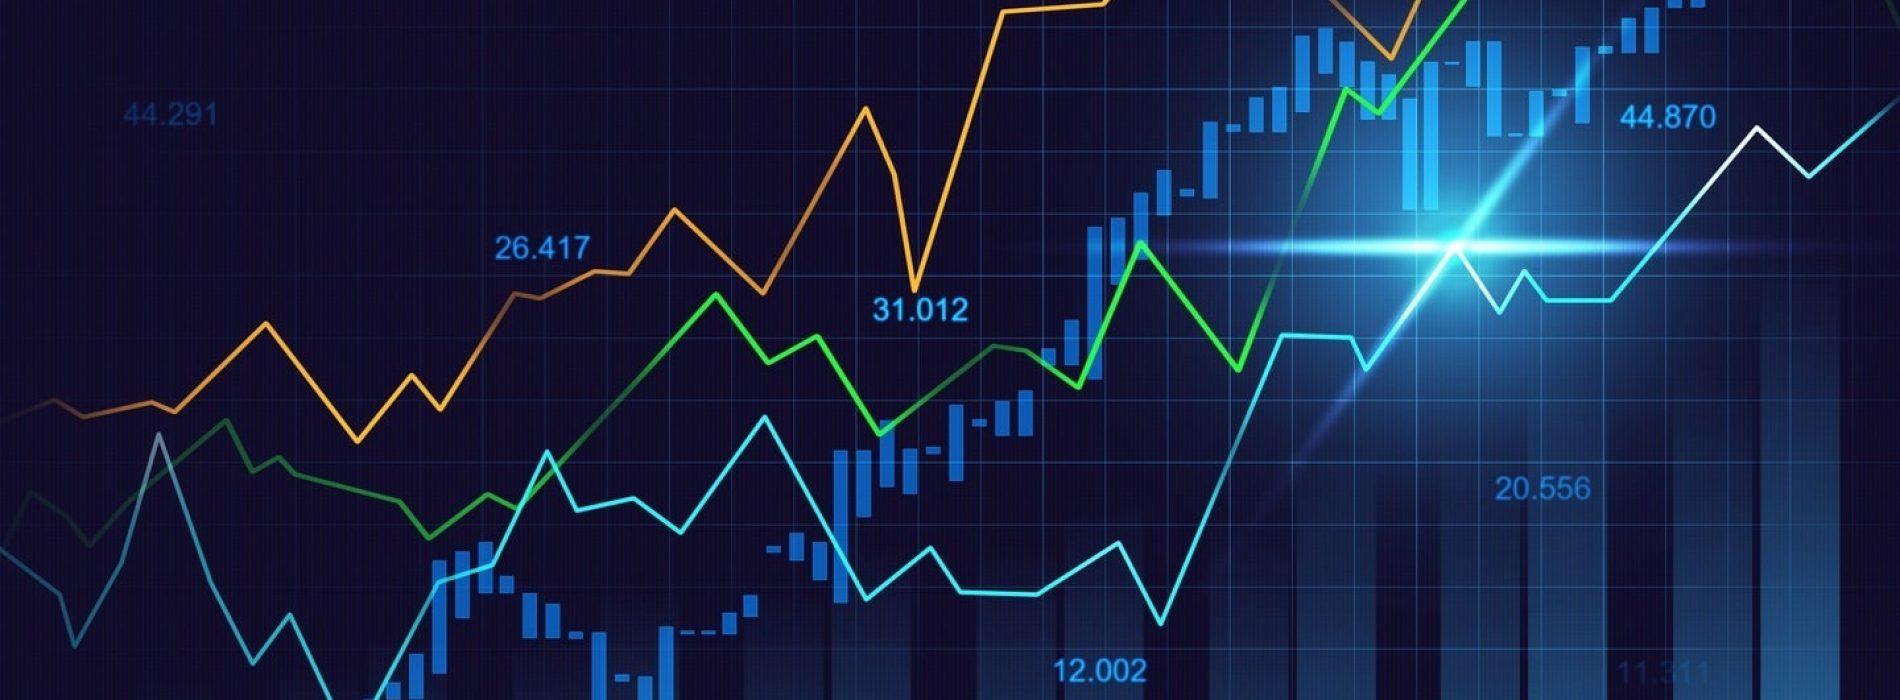 Always analyze your Forex trading performance